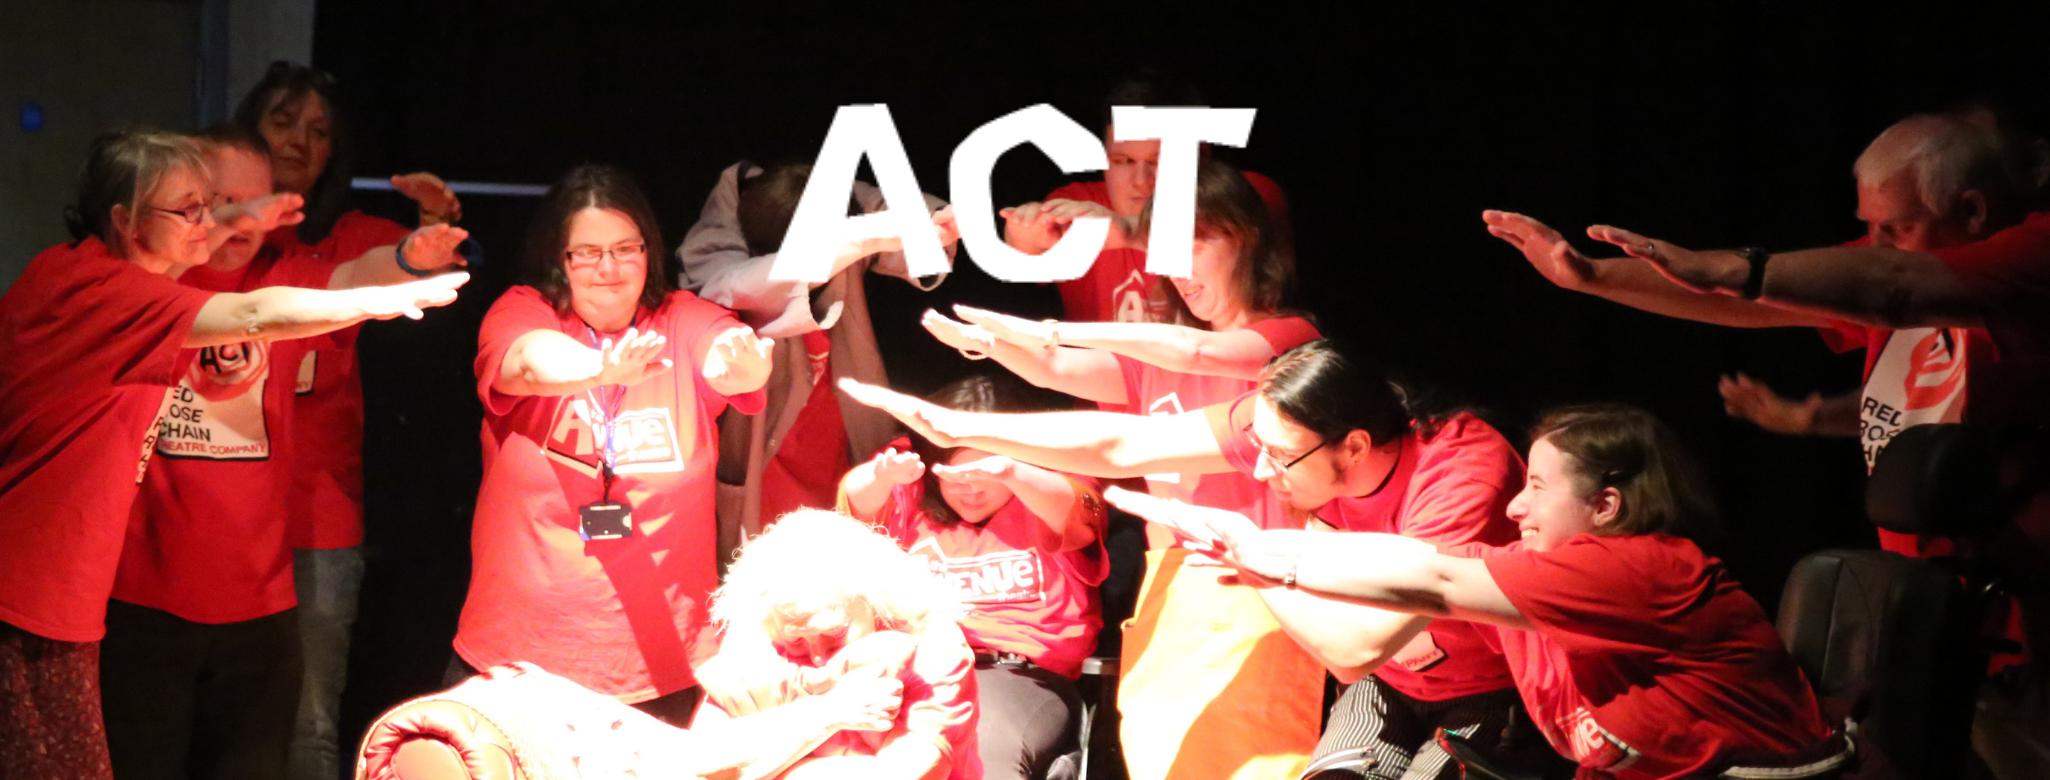 ACT – Lockdown